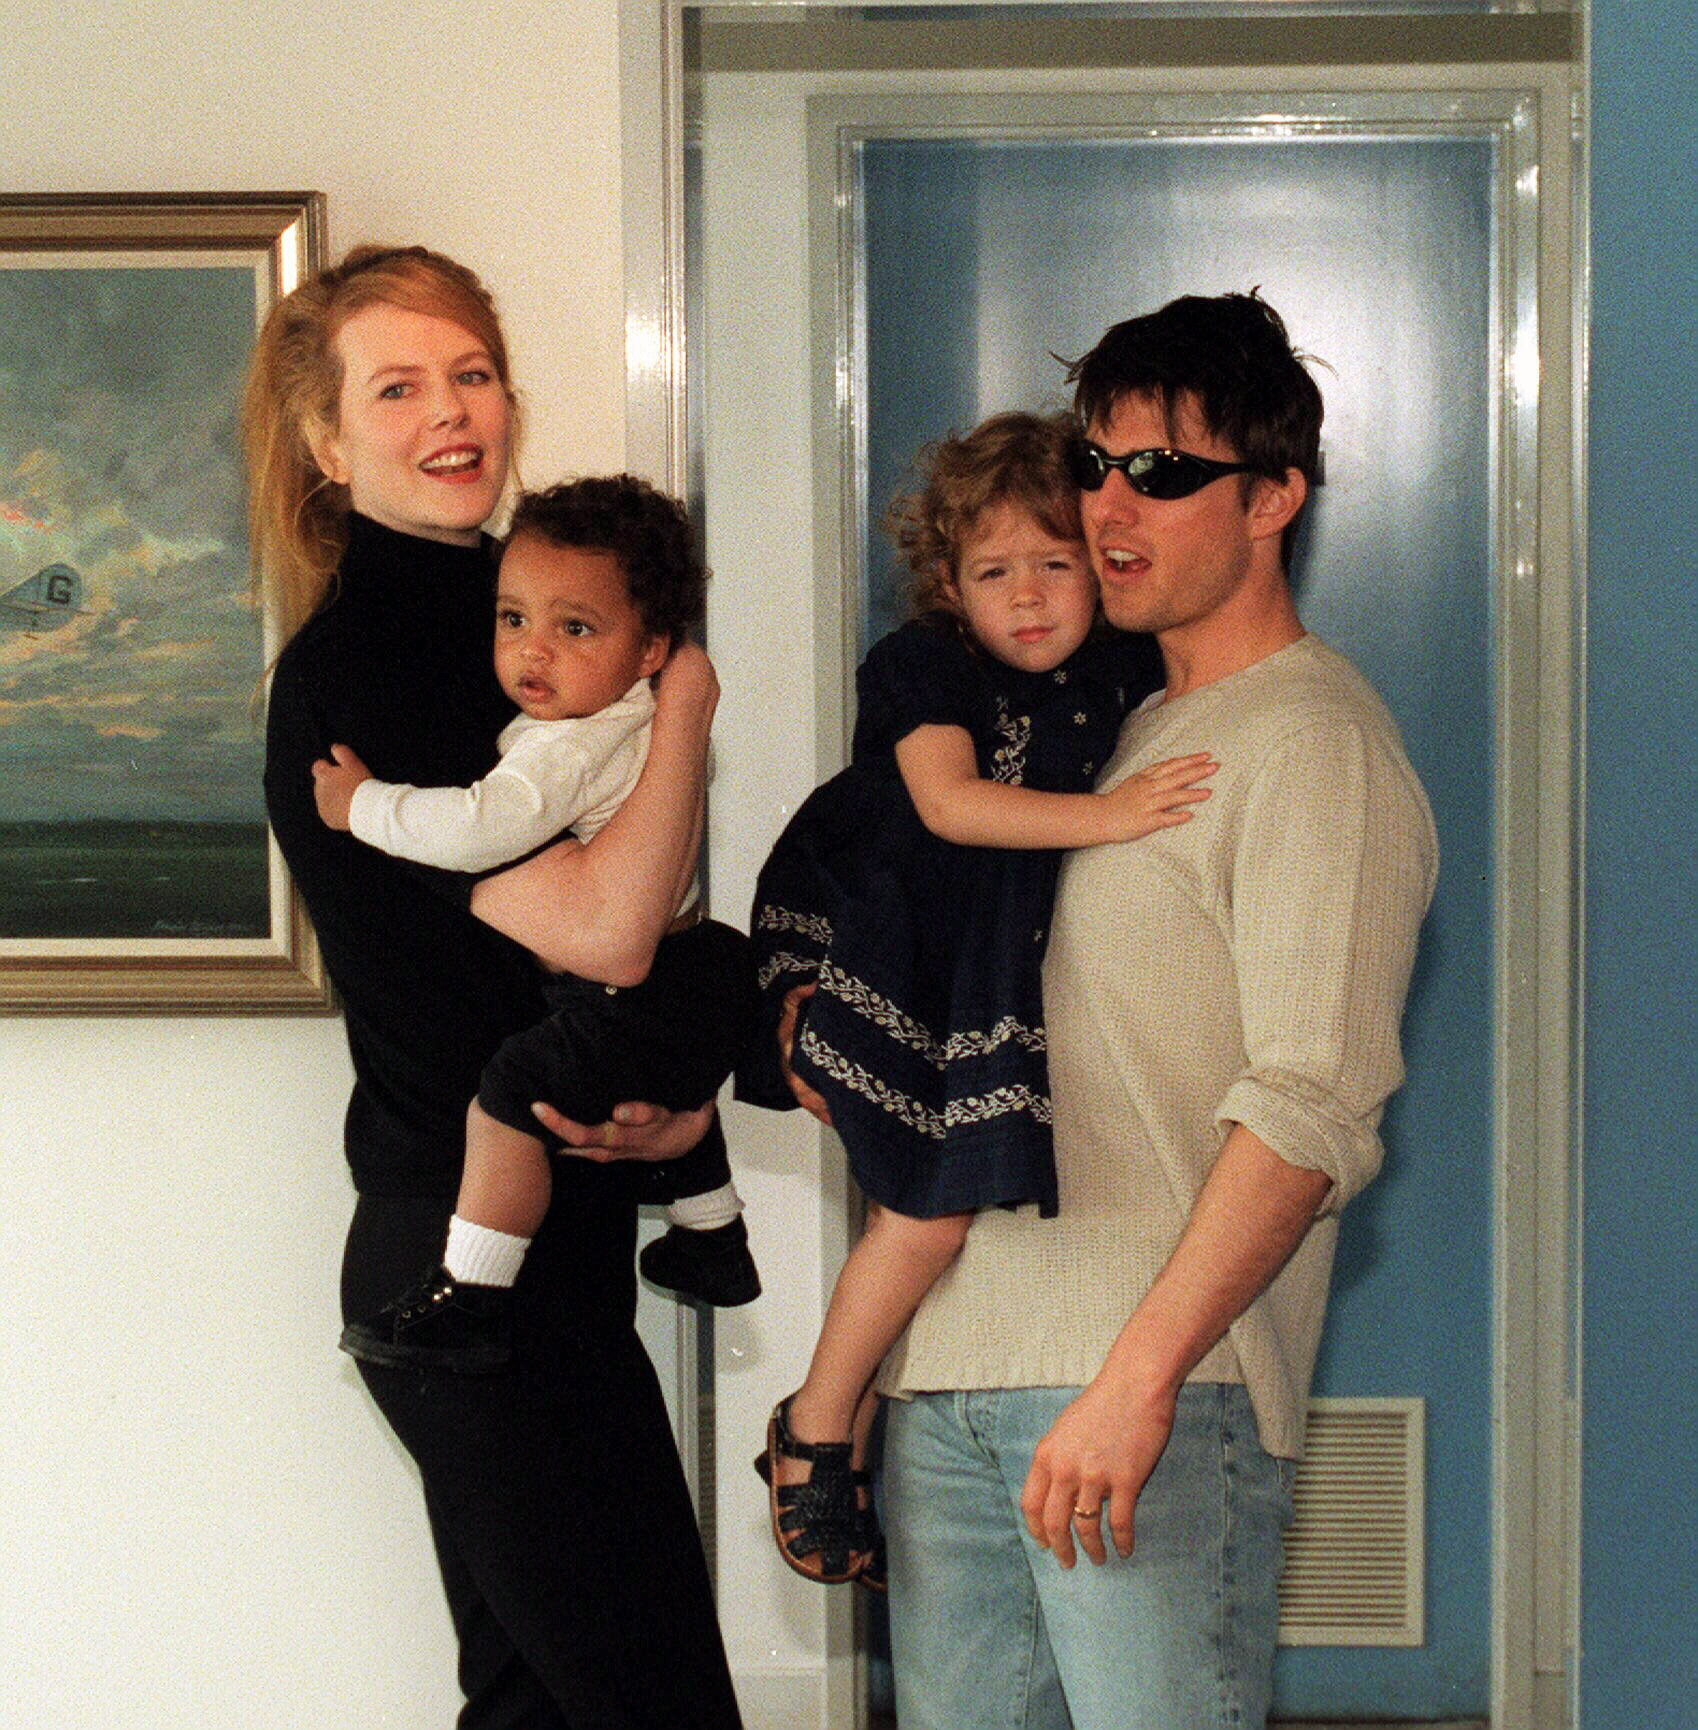 Tom Cruise Nicole Kidman Getty Images